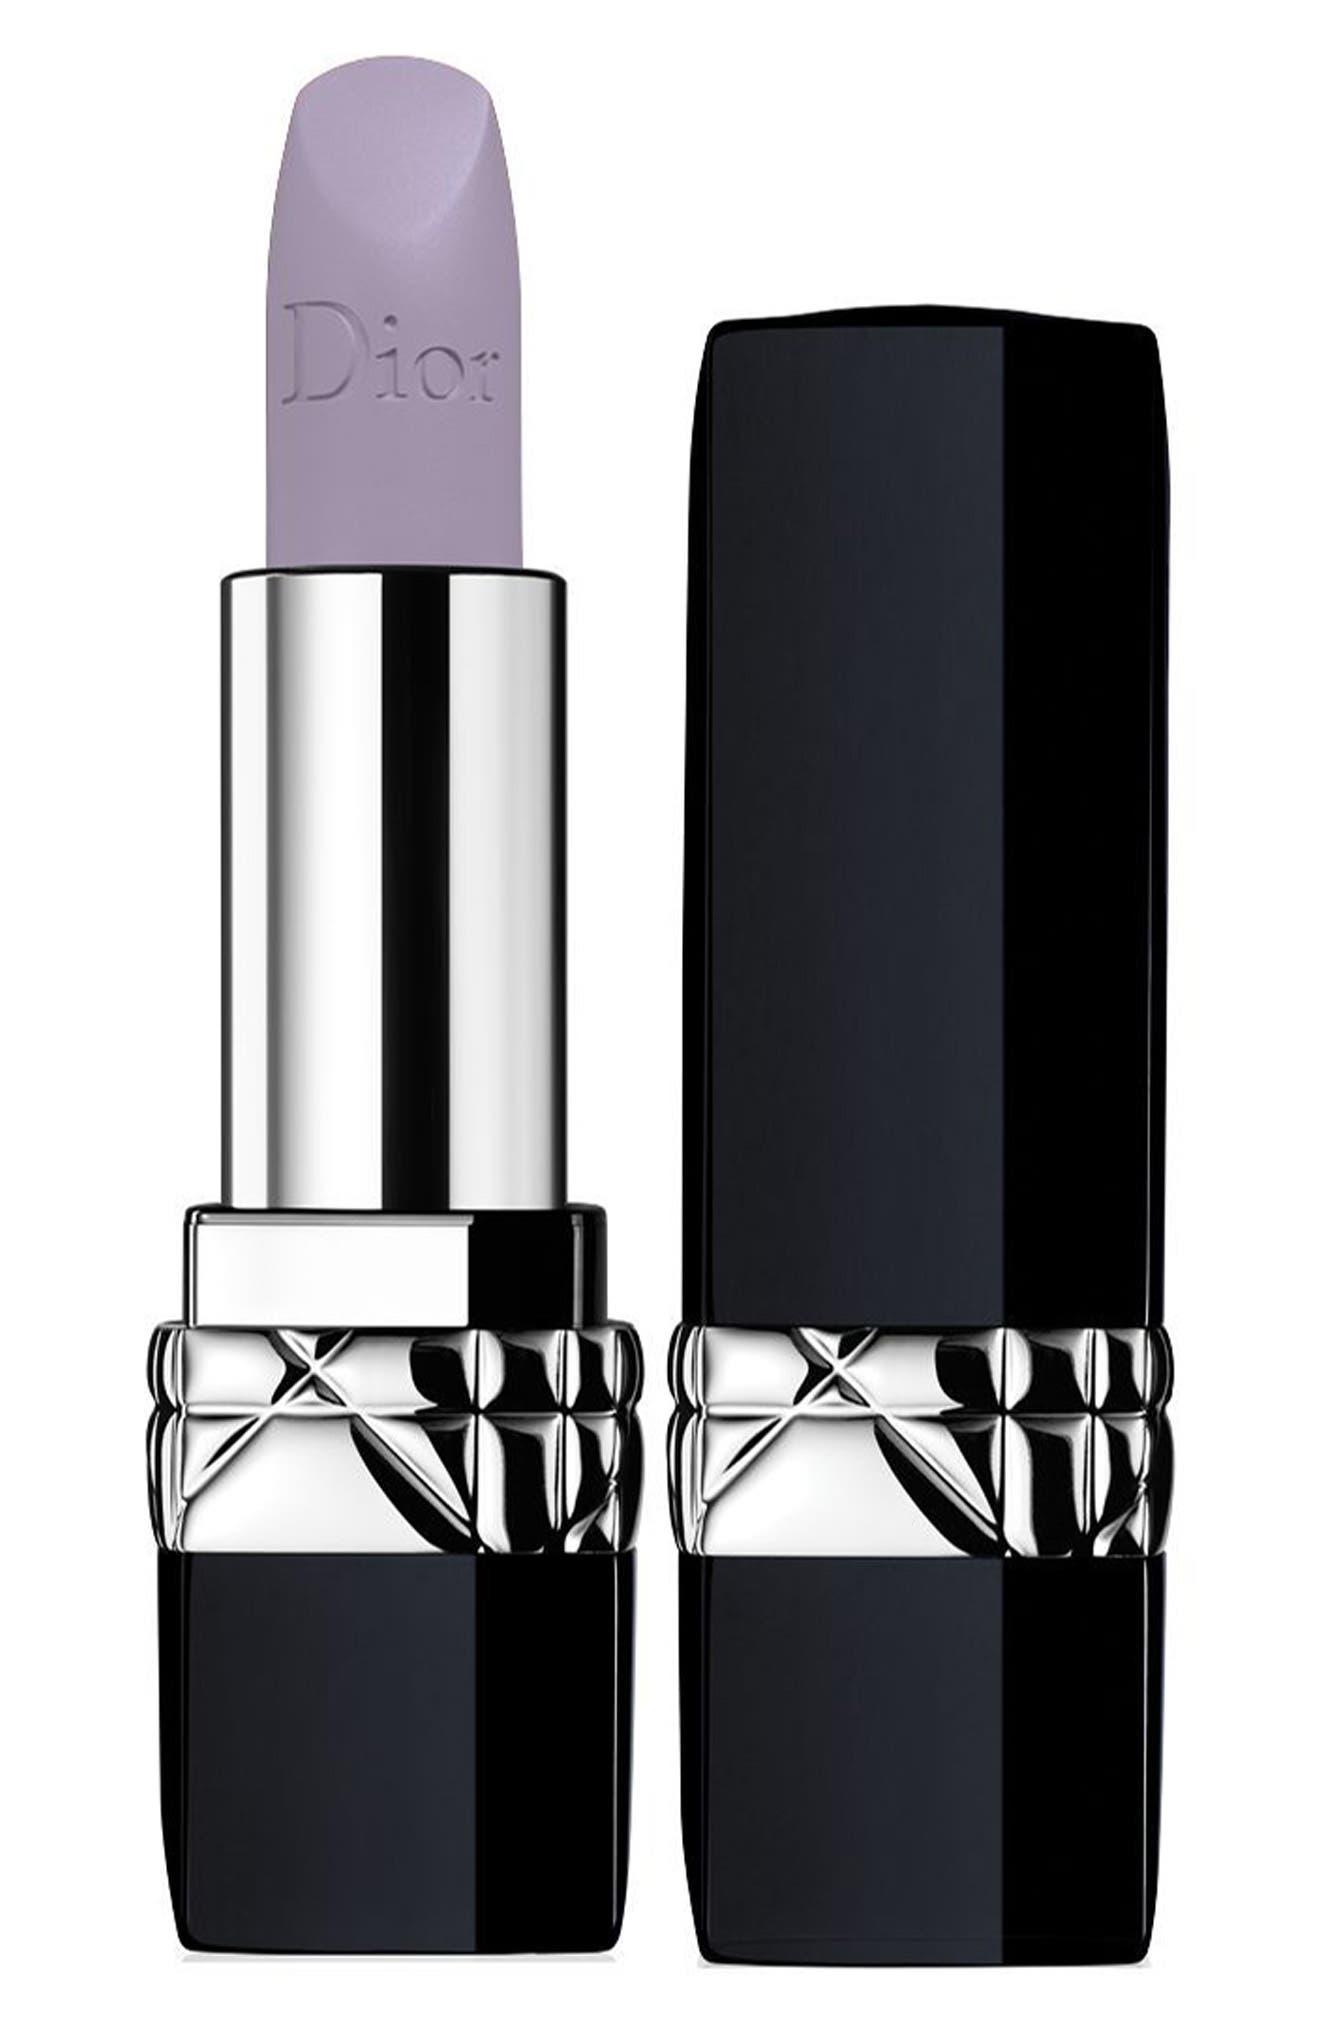 Dior Couture Color Rouge Dior Lipstick - 380 Cloudy Matte